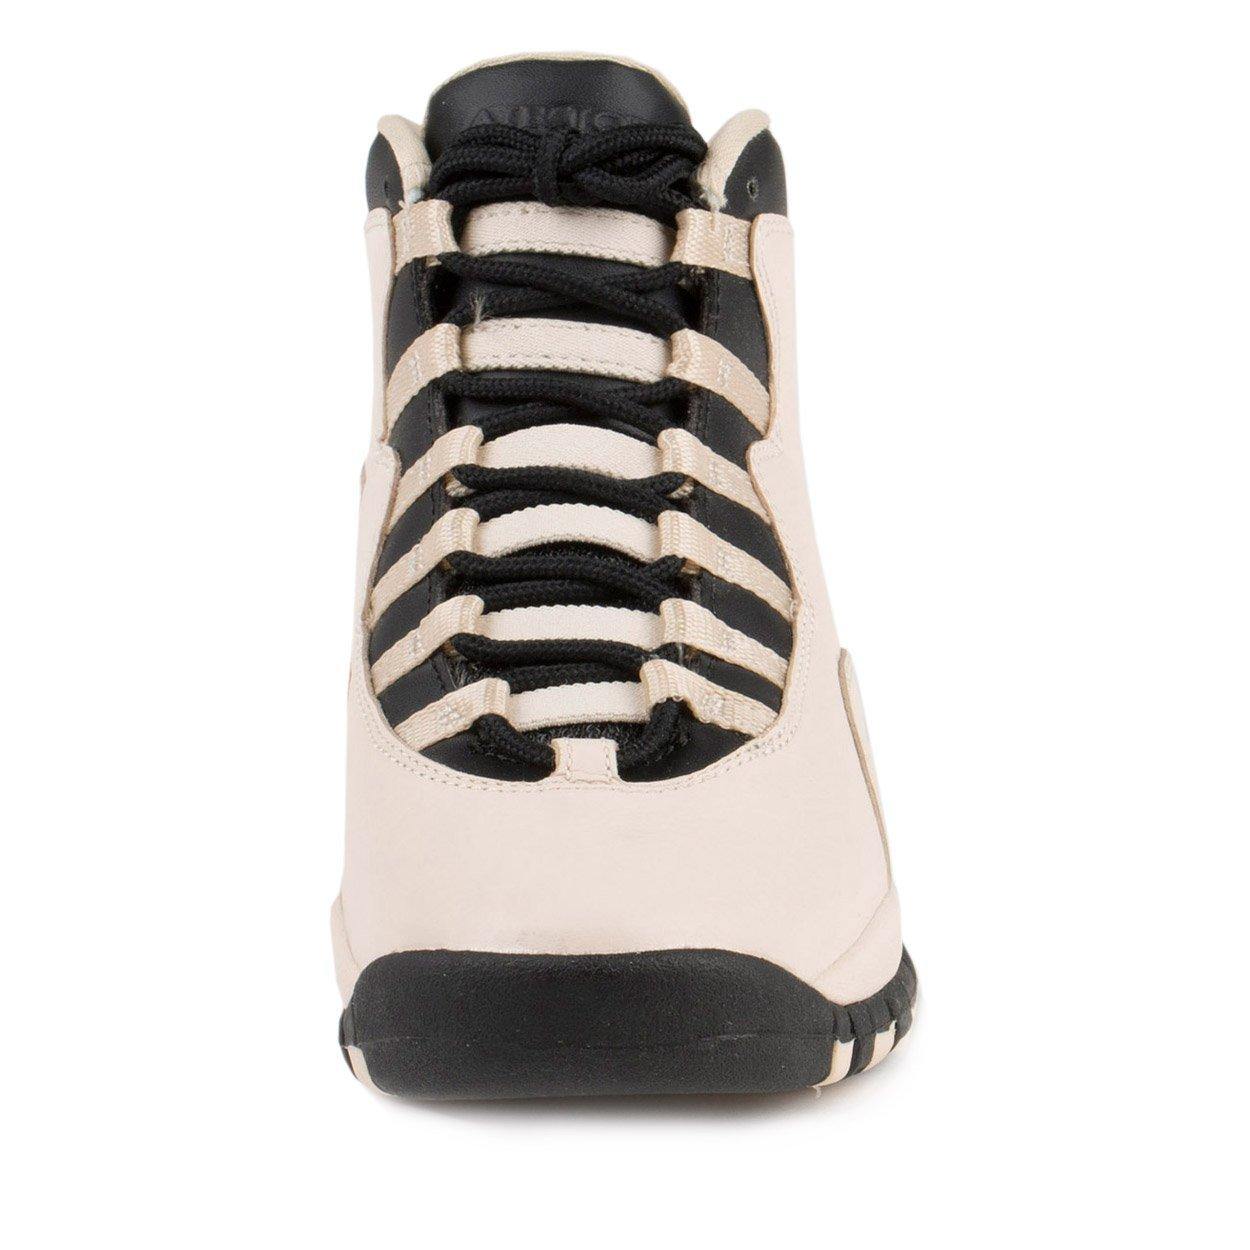 Jordan Nike Kids 10 Retro Prem GG Pearl White/Black/Black Basketball Shoe 6.5 Kids US by Jordan (Image #3)